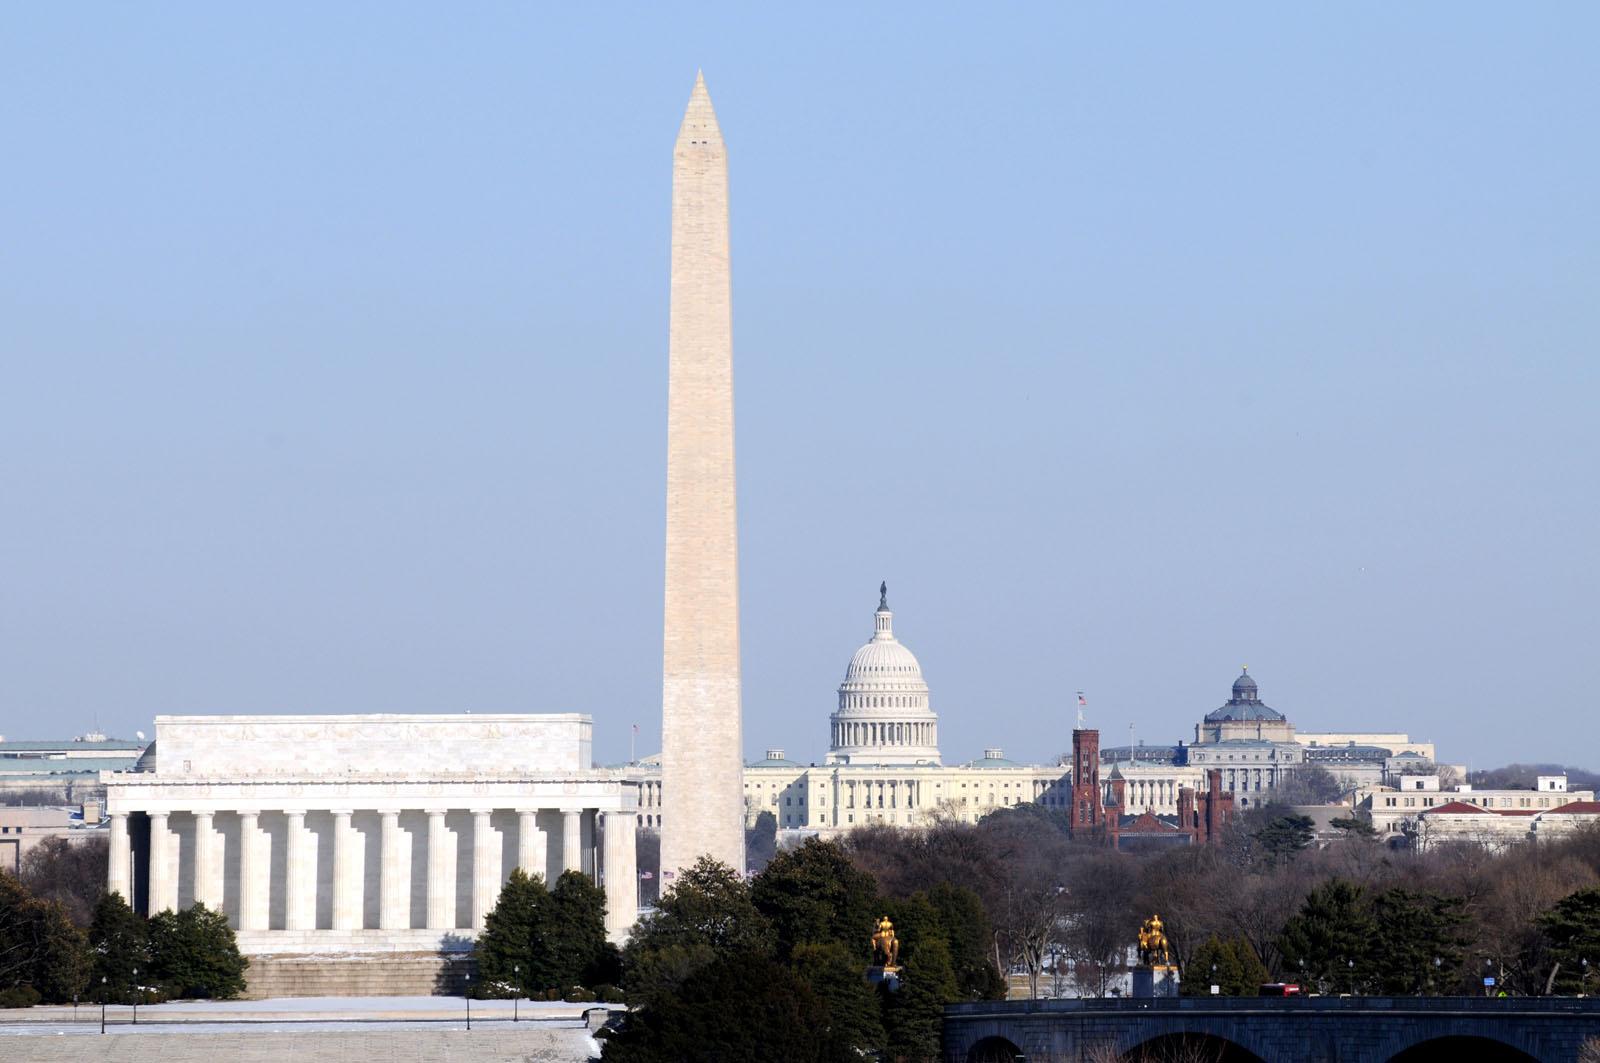 Cheap Hotels In Washington Dc Near The National Mall